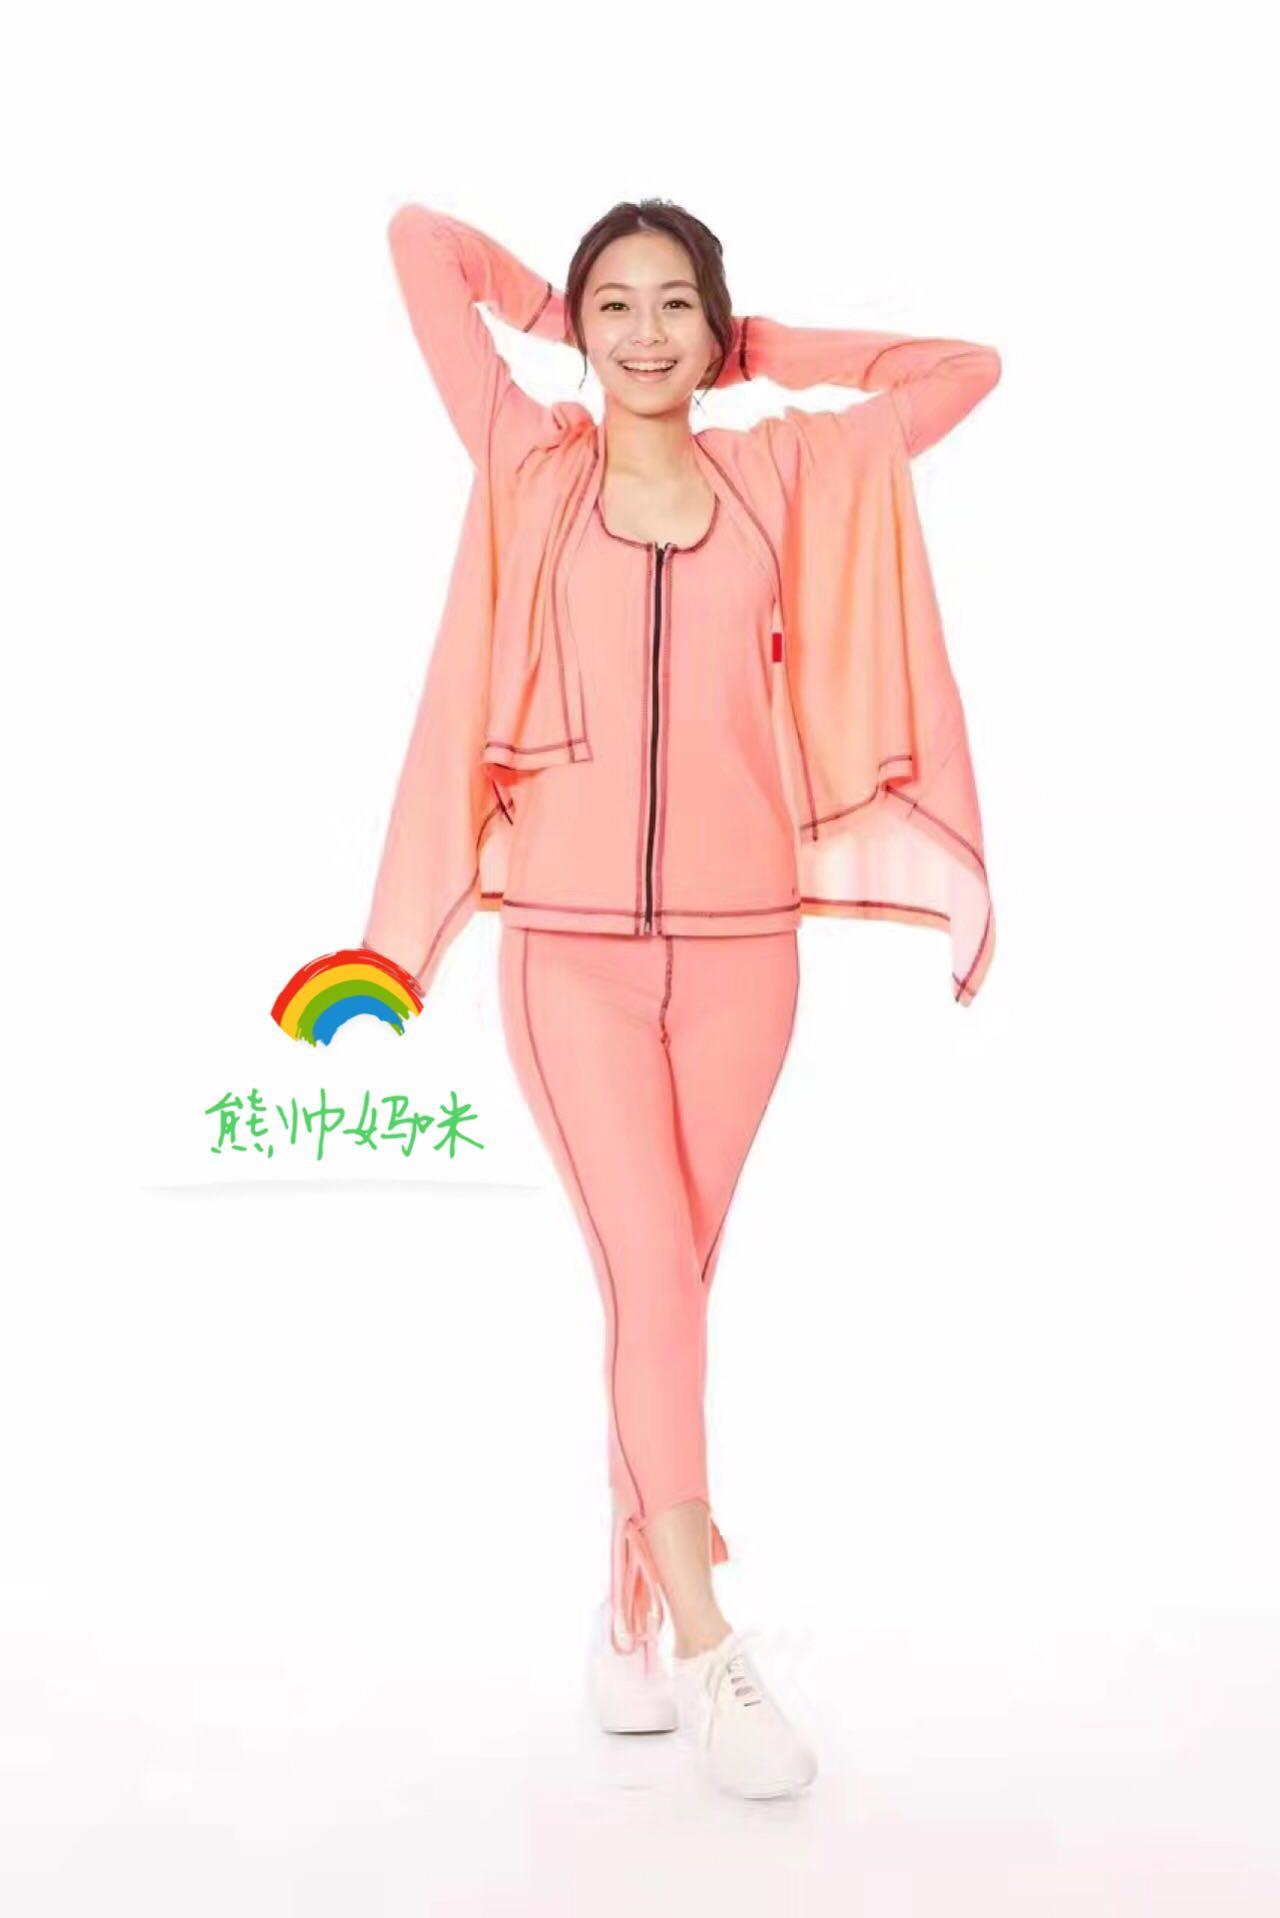 5ac88591889 lightbox moreview · lightbox moreview · lightbox moreview · lightbox  moreview. PrevNext. Taiwan hoii ...